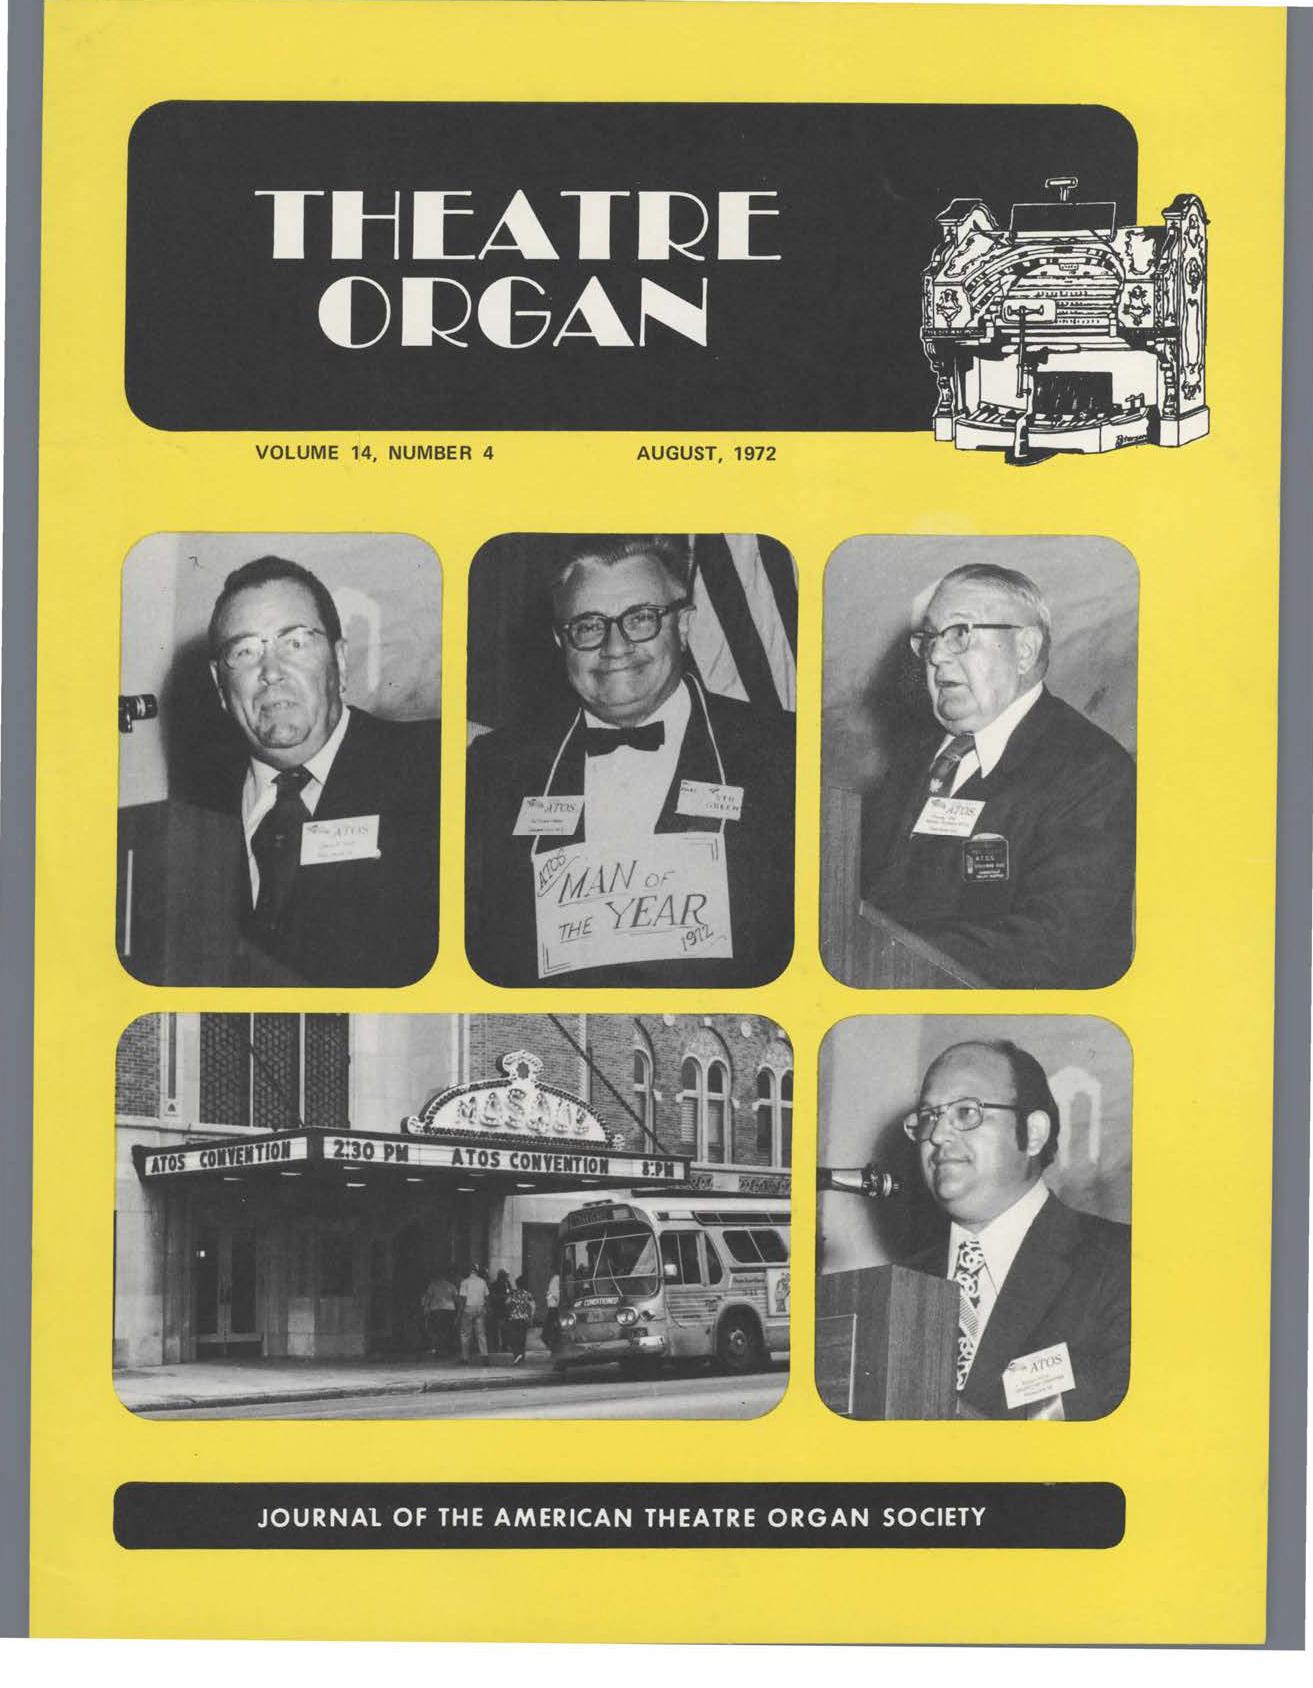 Theatre Organ, August 1972, Volume 14, Number 4